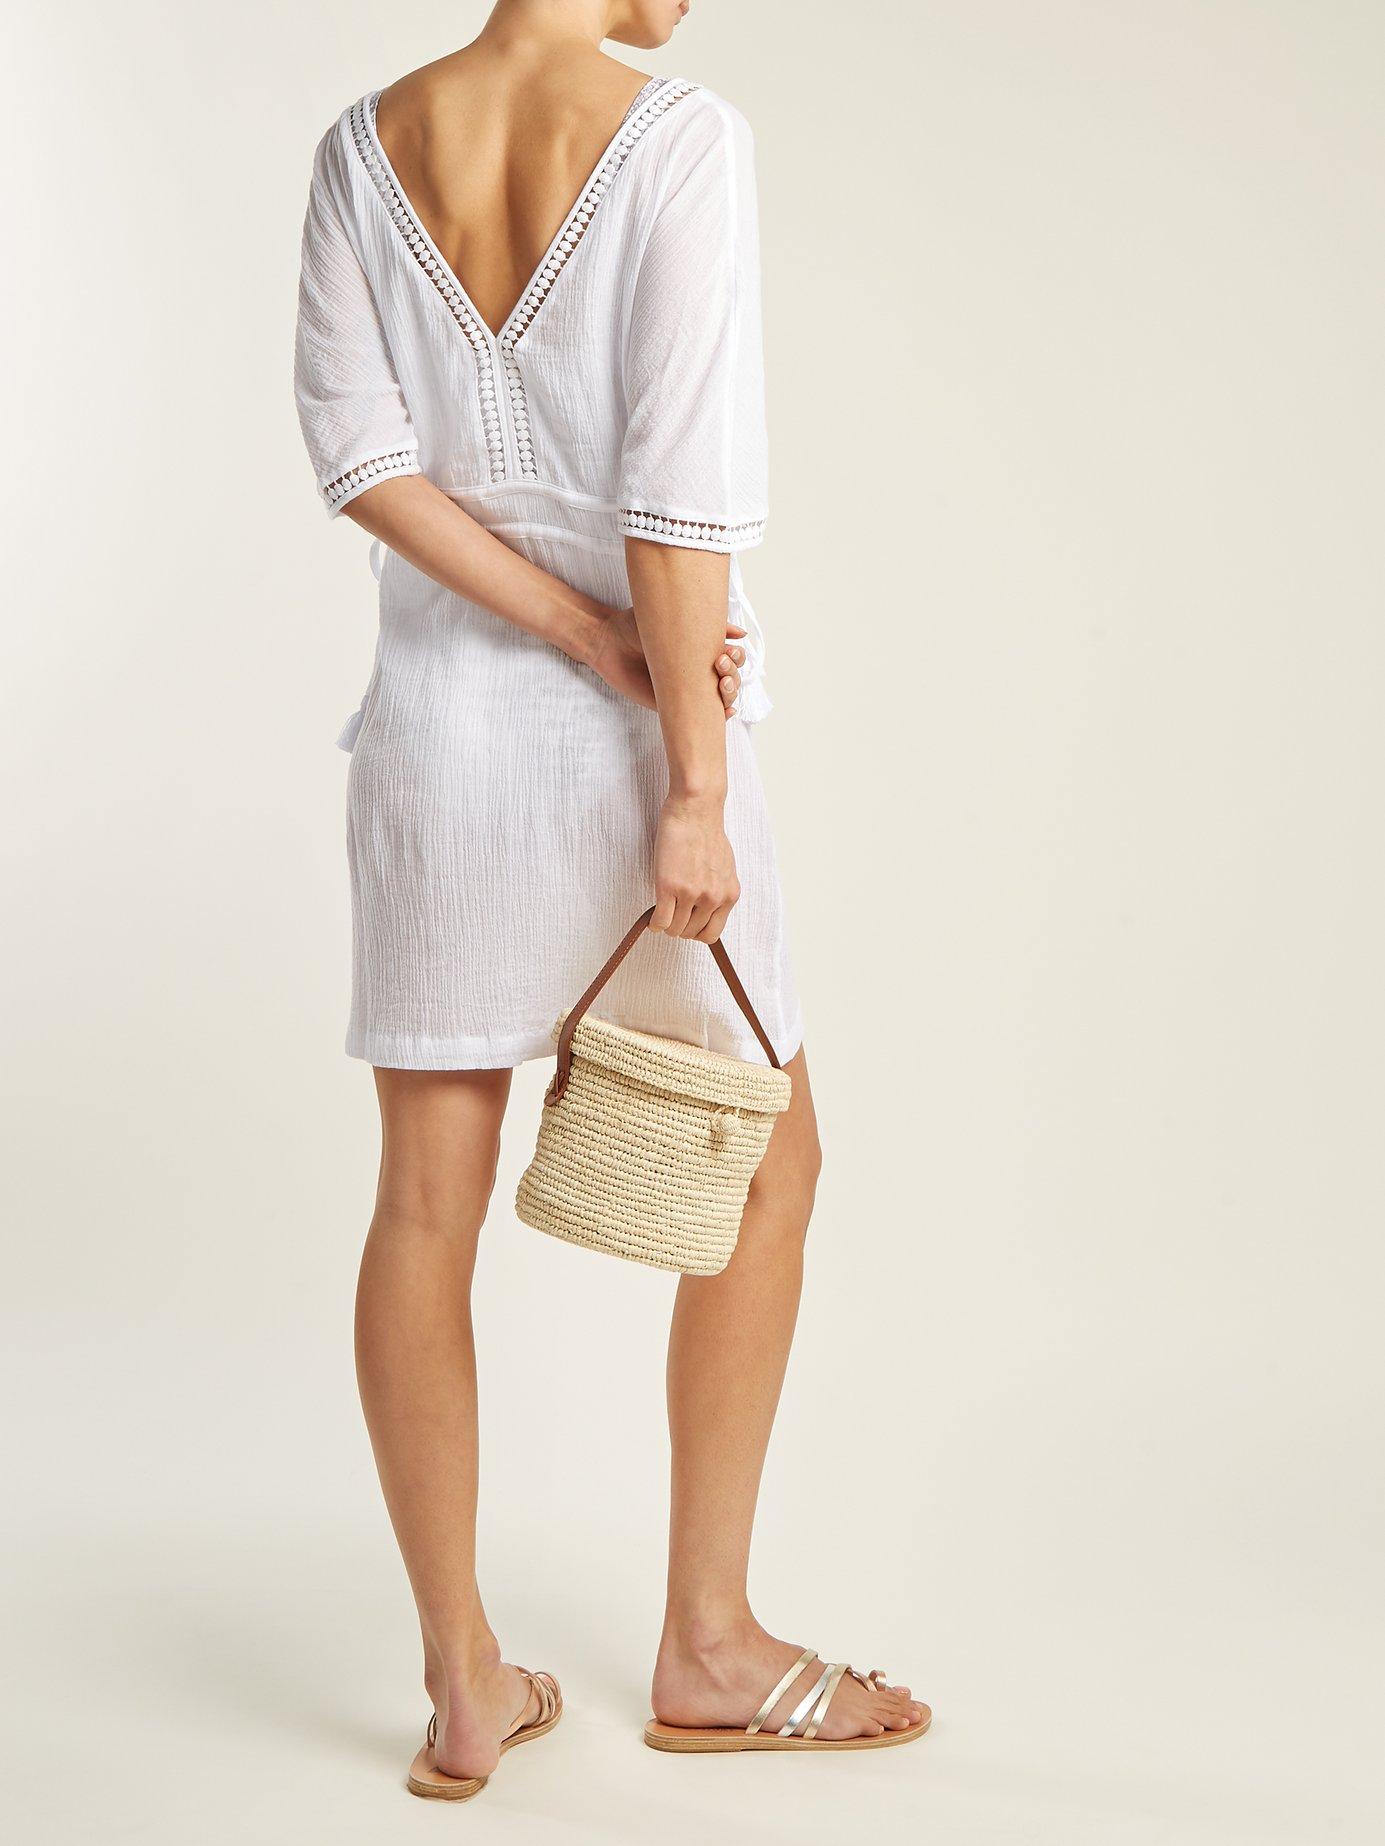 Photo of Moorea lace-trimmed cotton shirtdress by Heidi Klein - shop Heidi Klein dressesonline sales